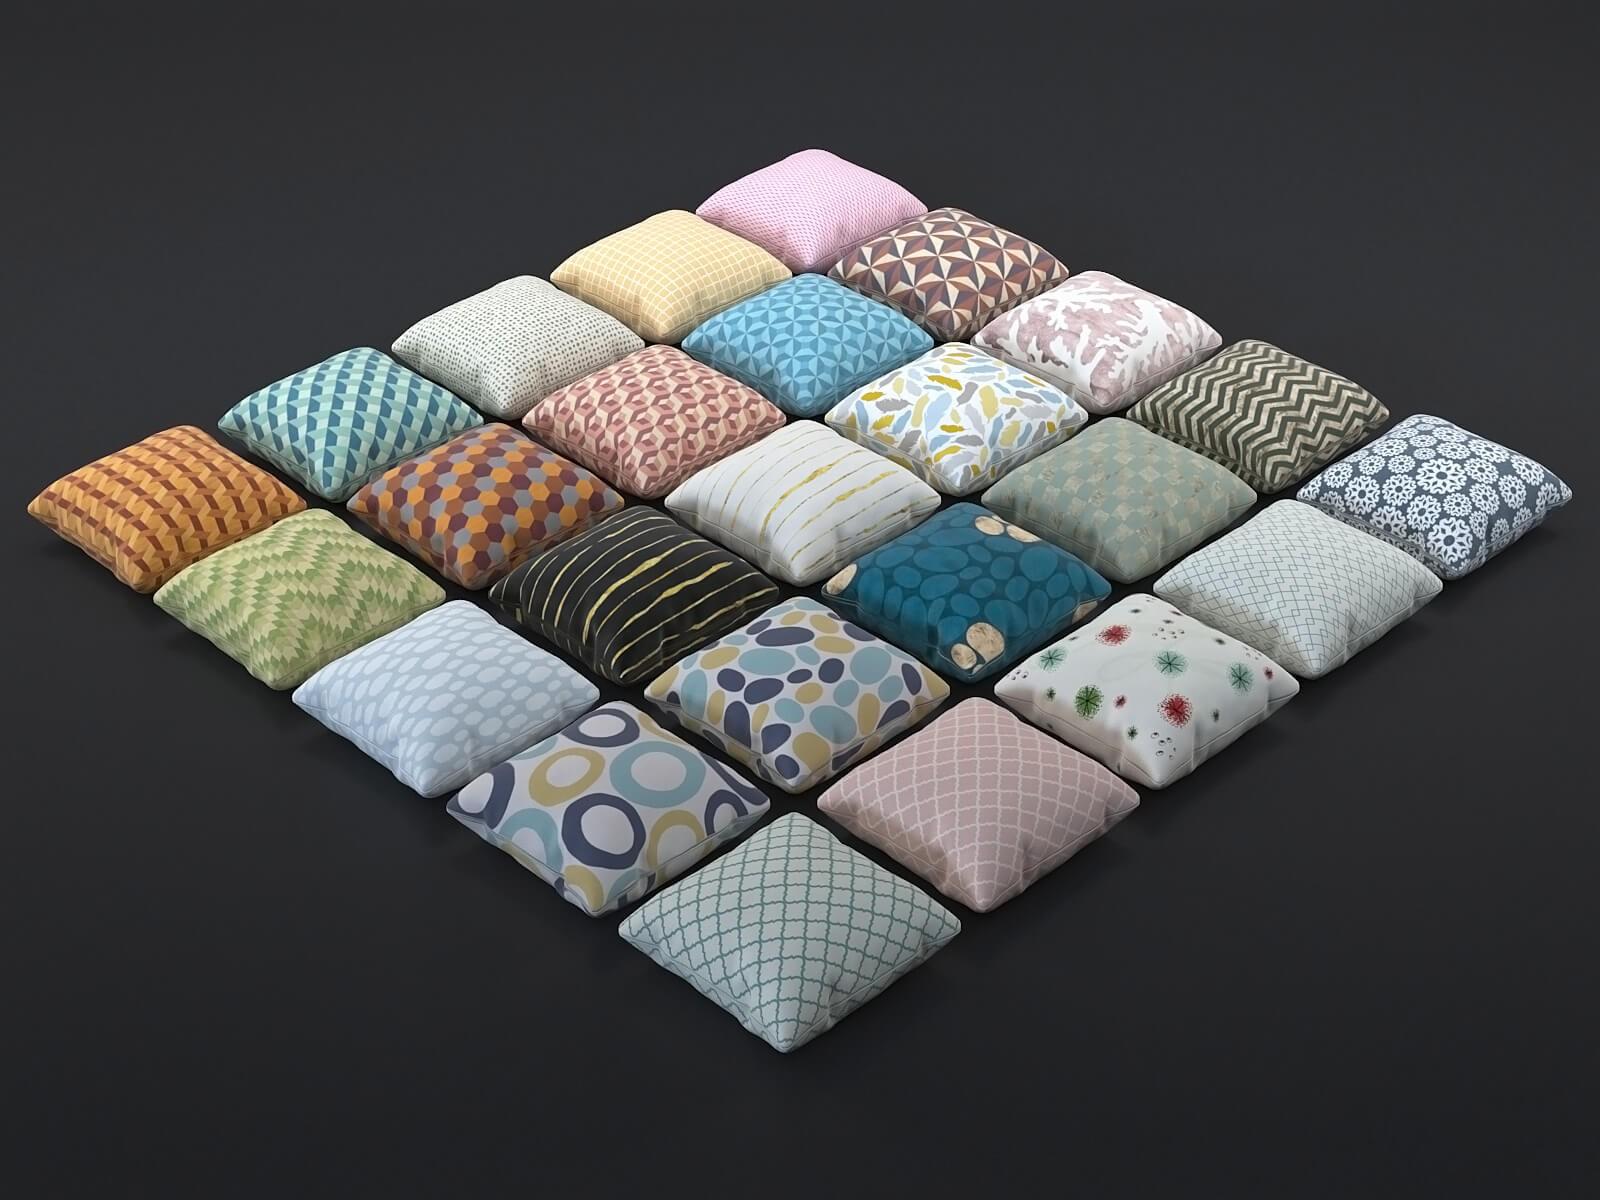 Pattern cushions 1 (set of 25)